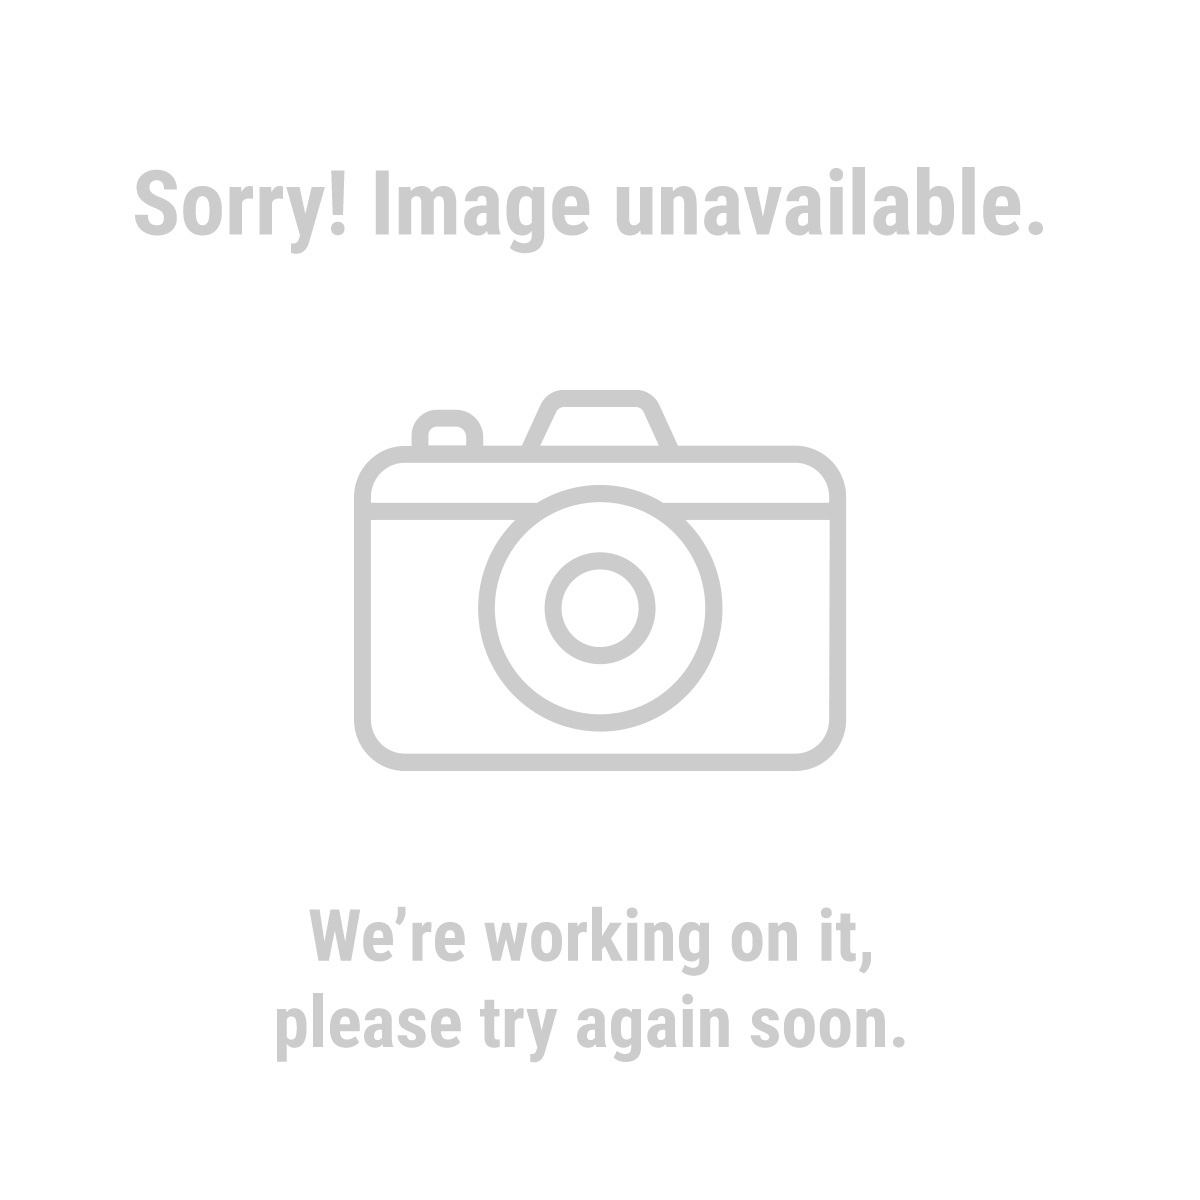 Harbor freight air compressor oil for Harbor freight compressor motor